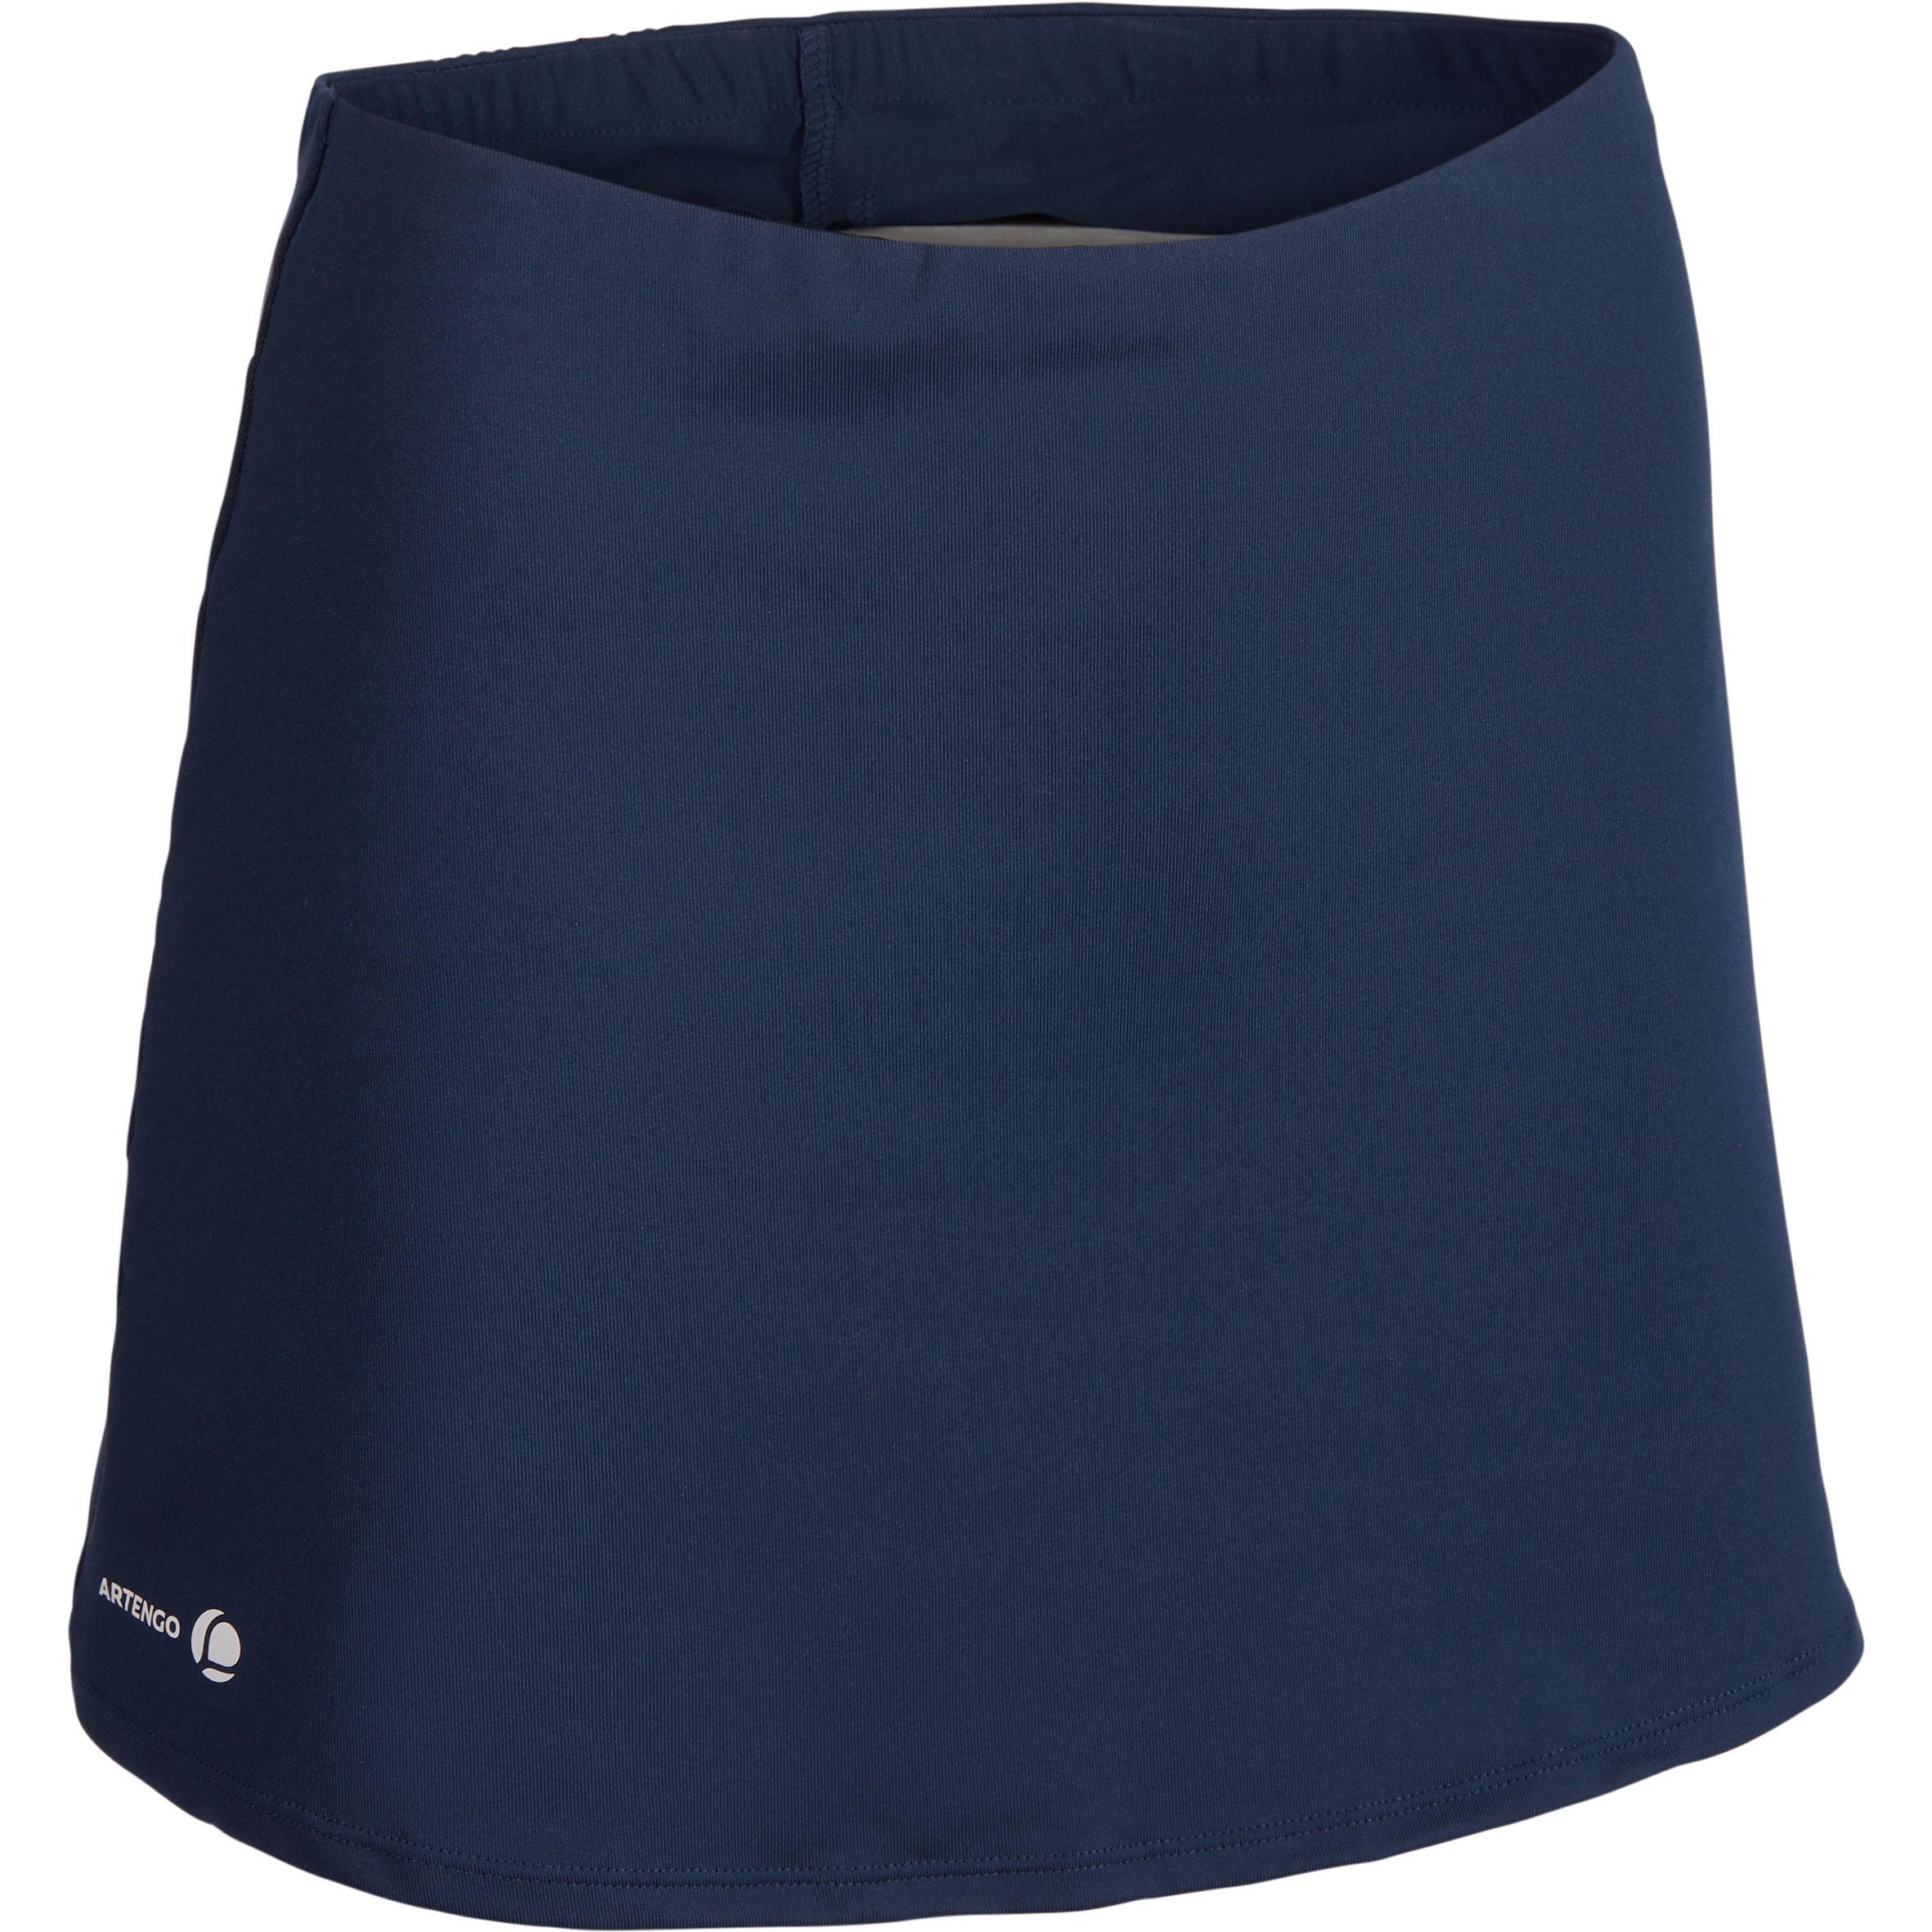 Essential Women's Tennis Badminton Table Tennis Padel Squash Skirt - Navy